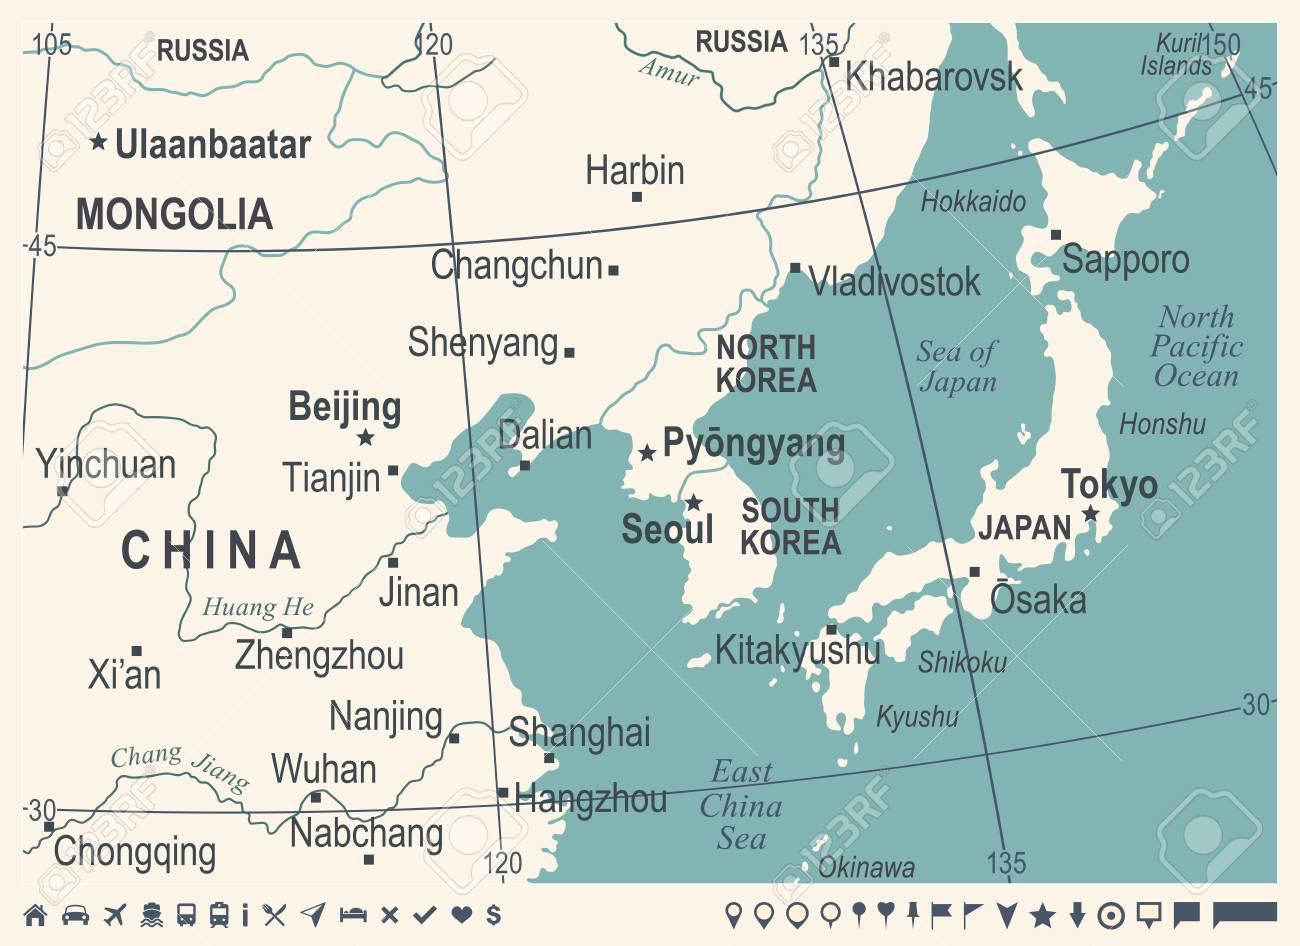 North Korea South Korea Japan China Russia Mongolia Map - Vintage ...